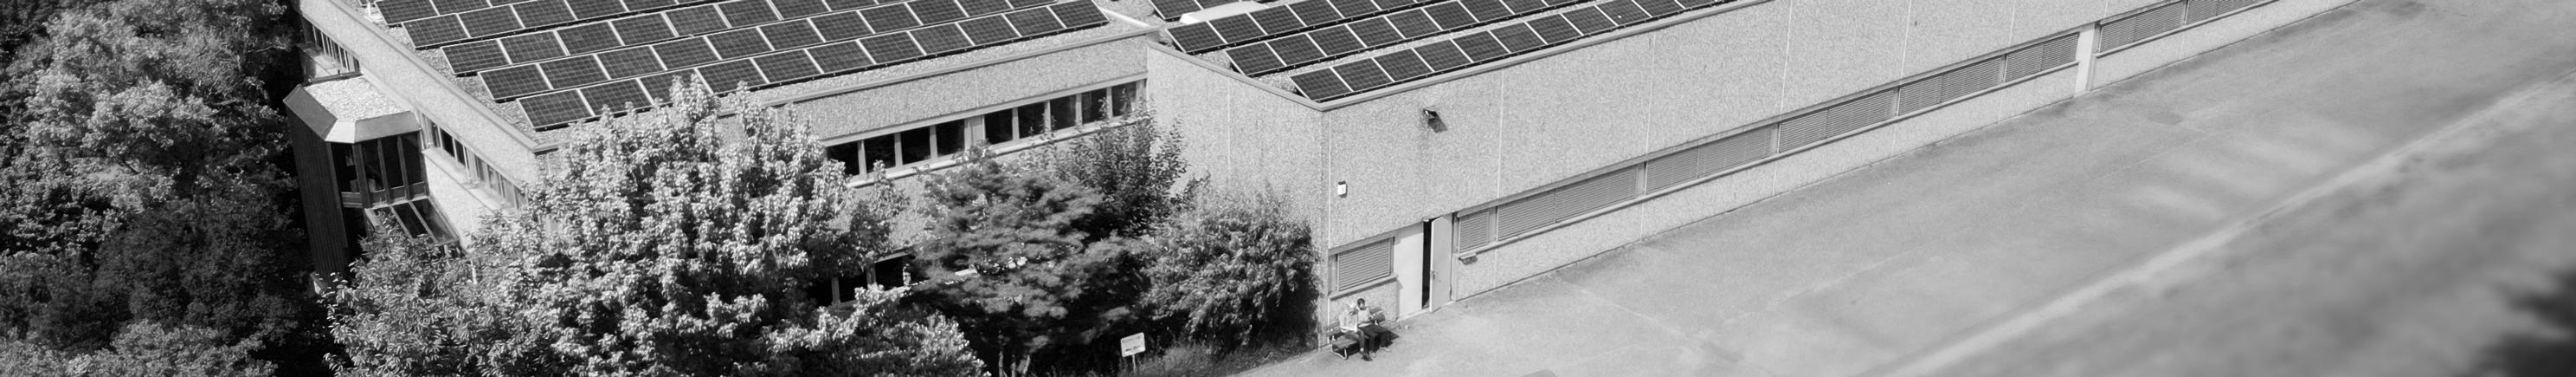 Henninger Gebaeude mit Solar Panels